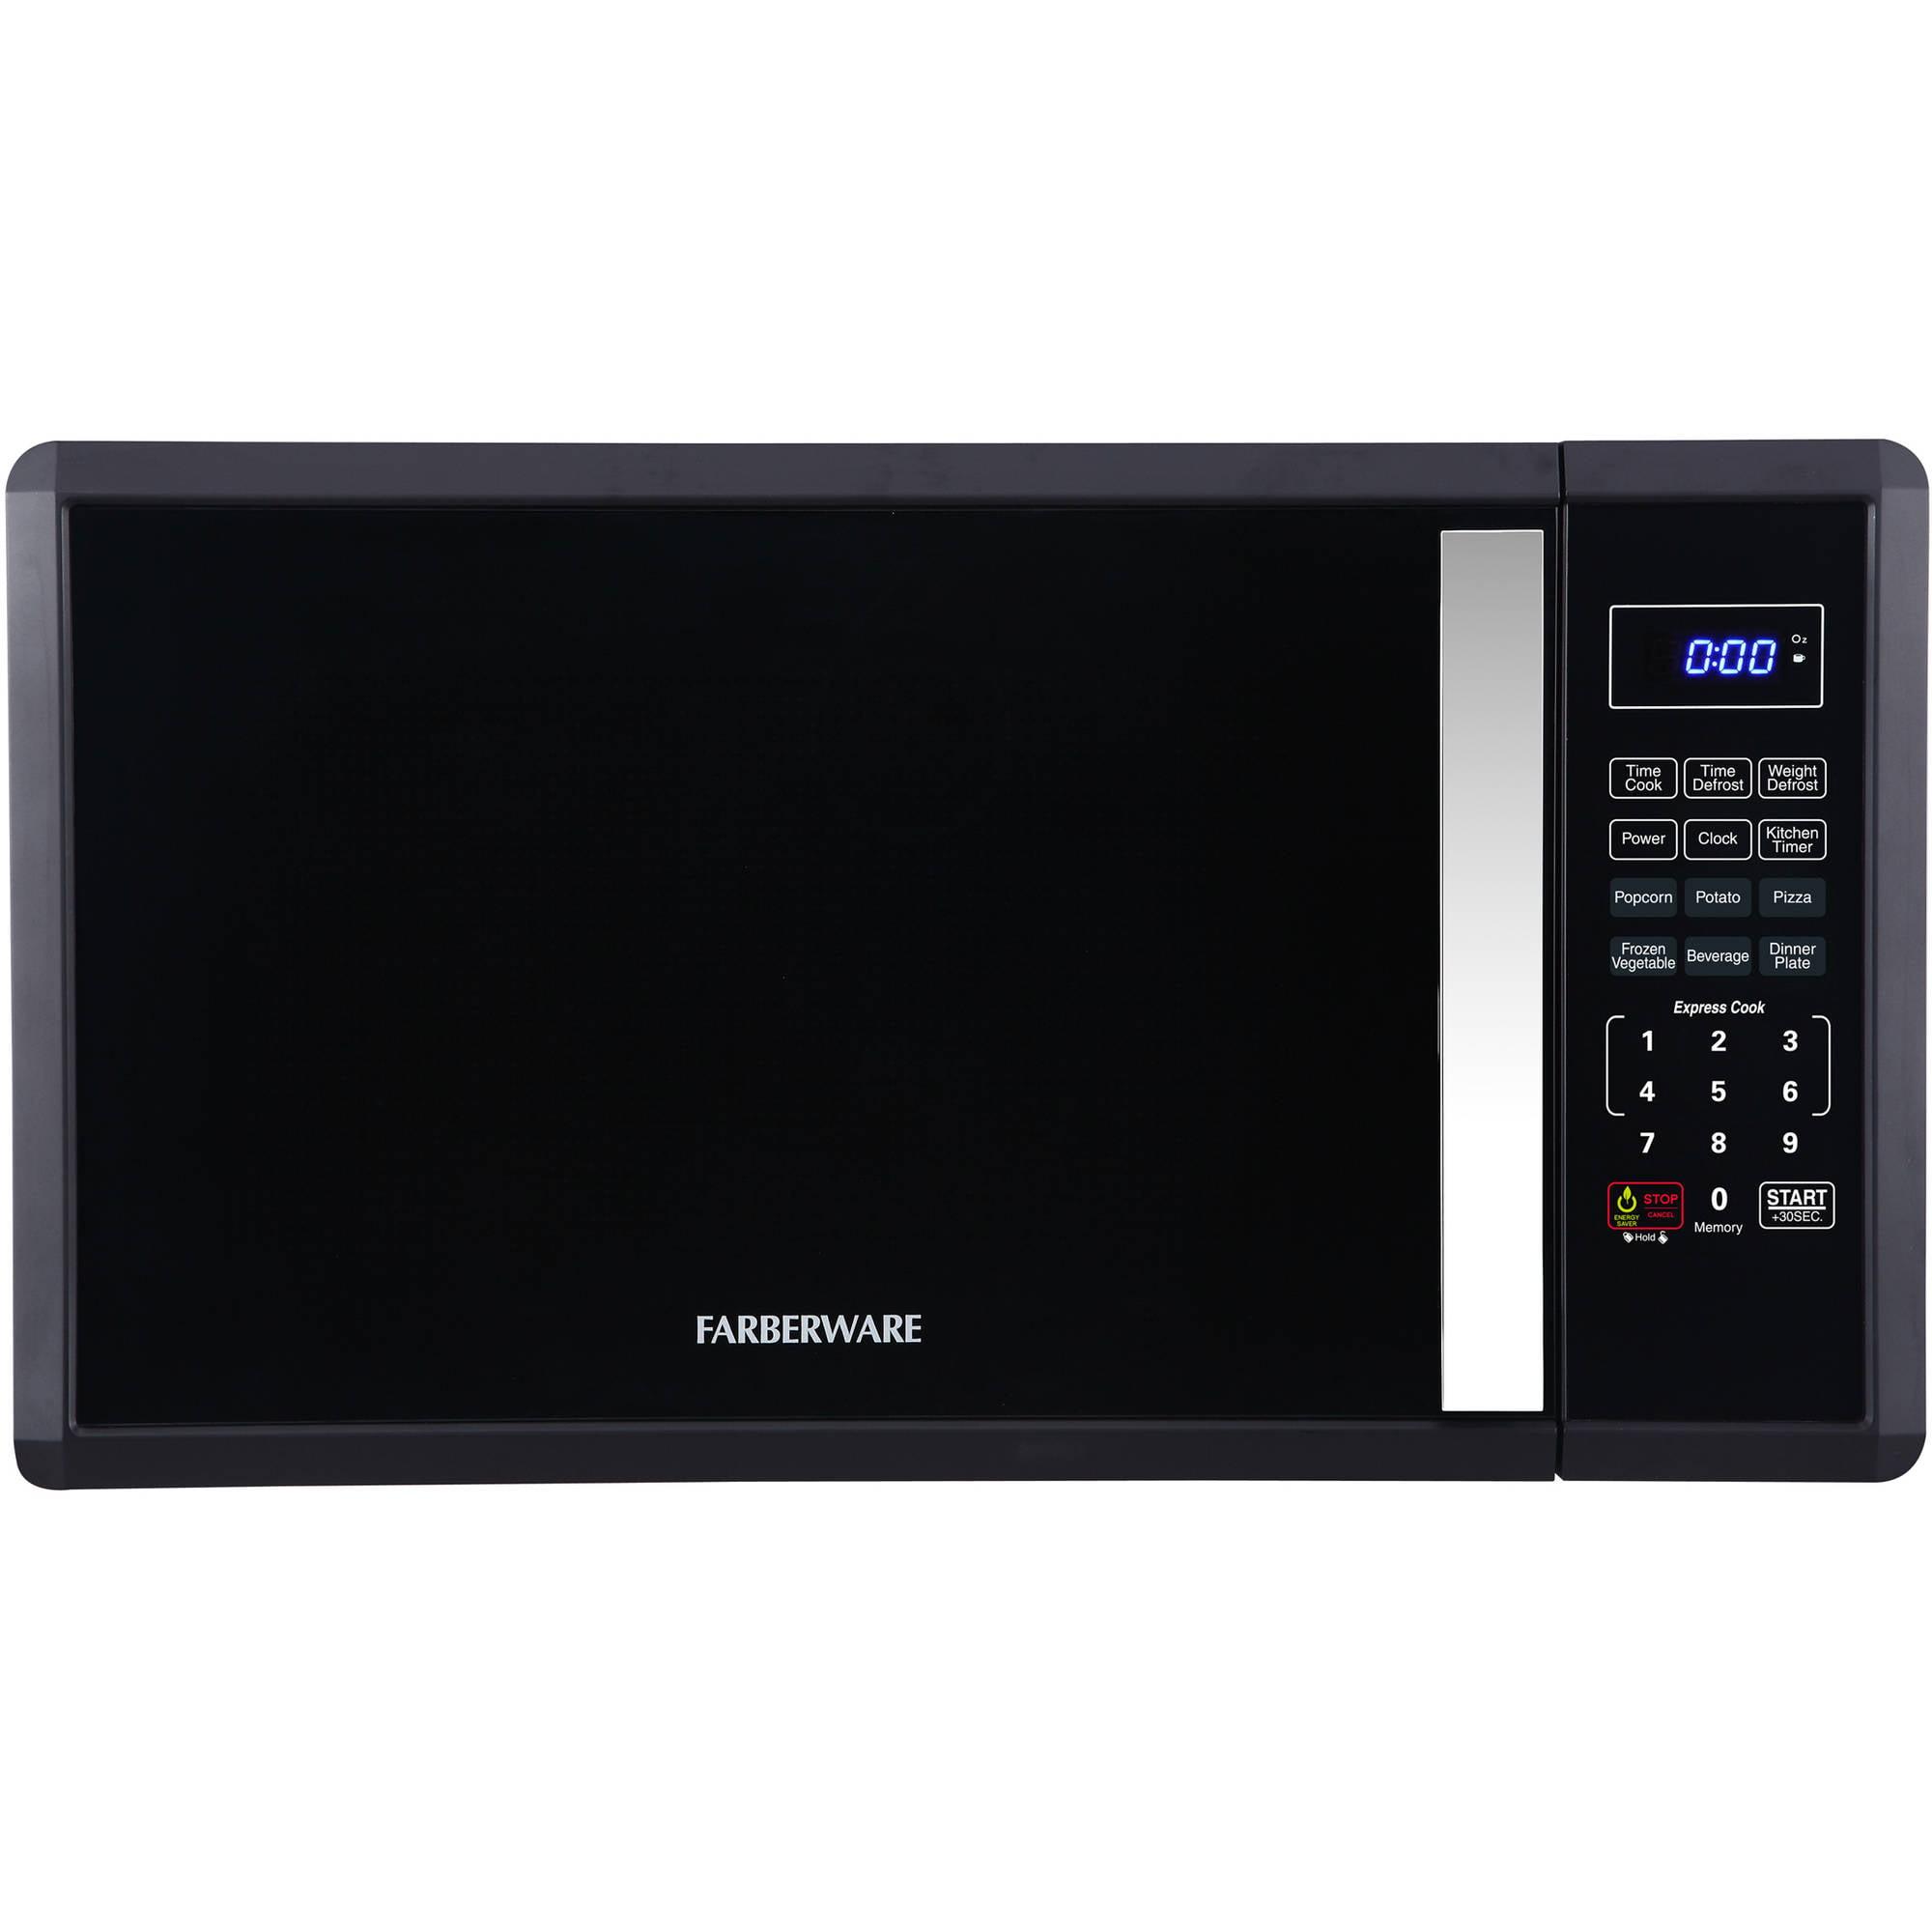 Farberware 1.1 cu ft Soft Touch 1000-Watt Microwave, Black